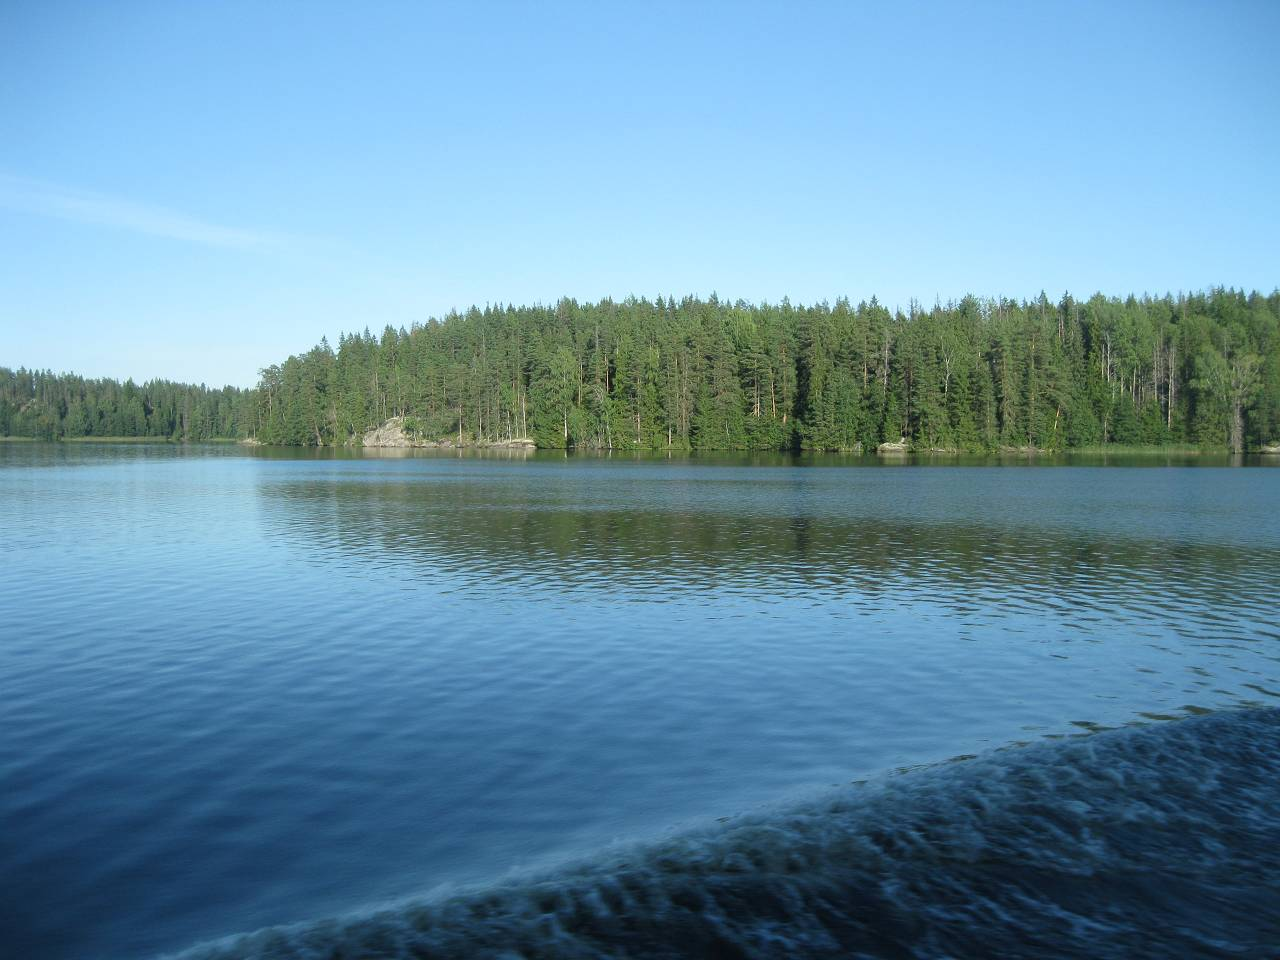 Viajando a Vybor Saimaa Canal atravesa lagos, ahora rusos.